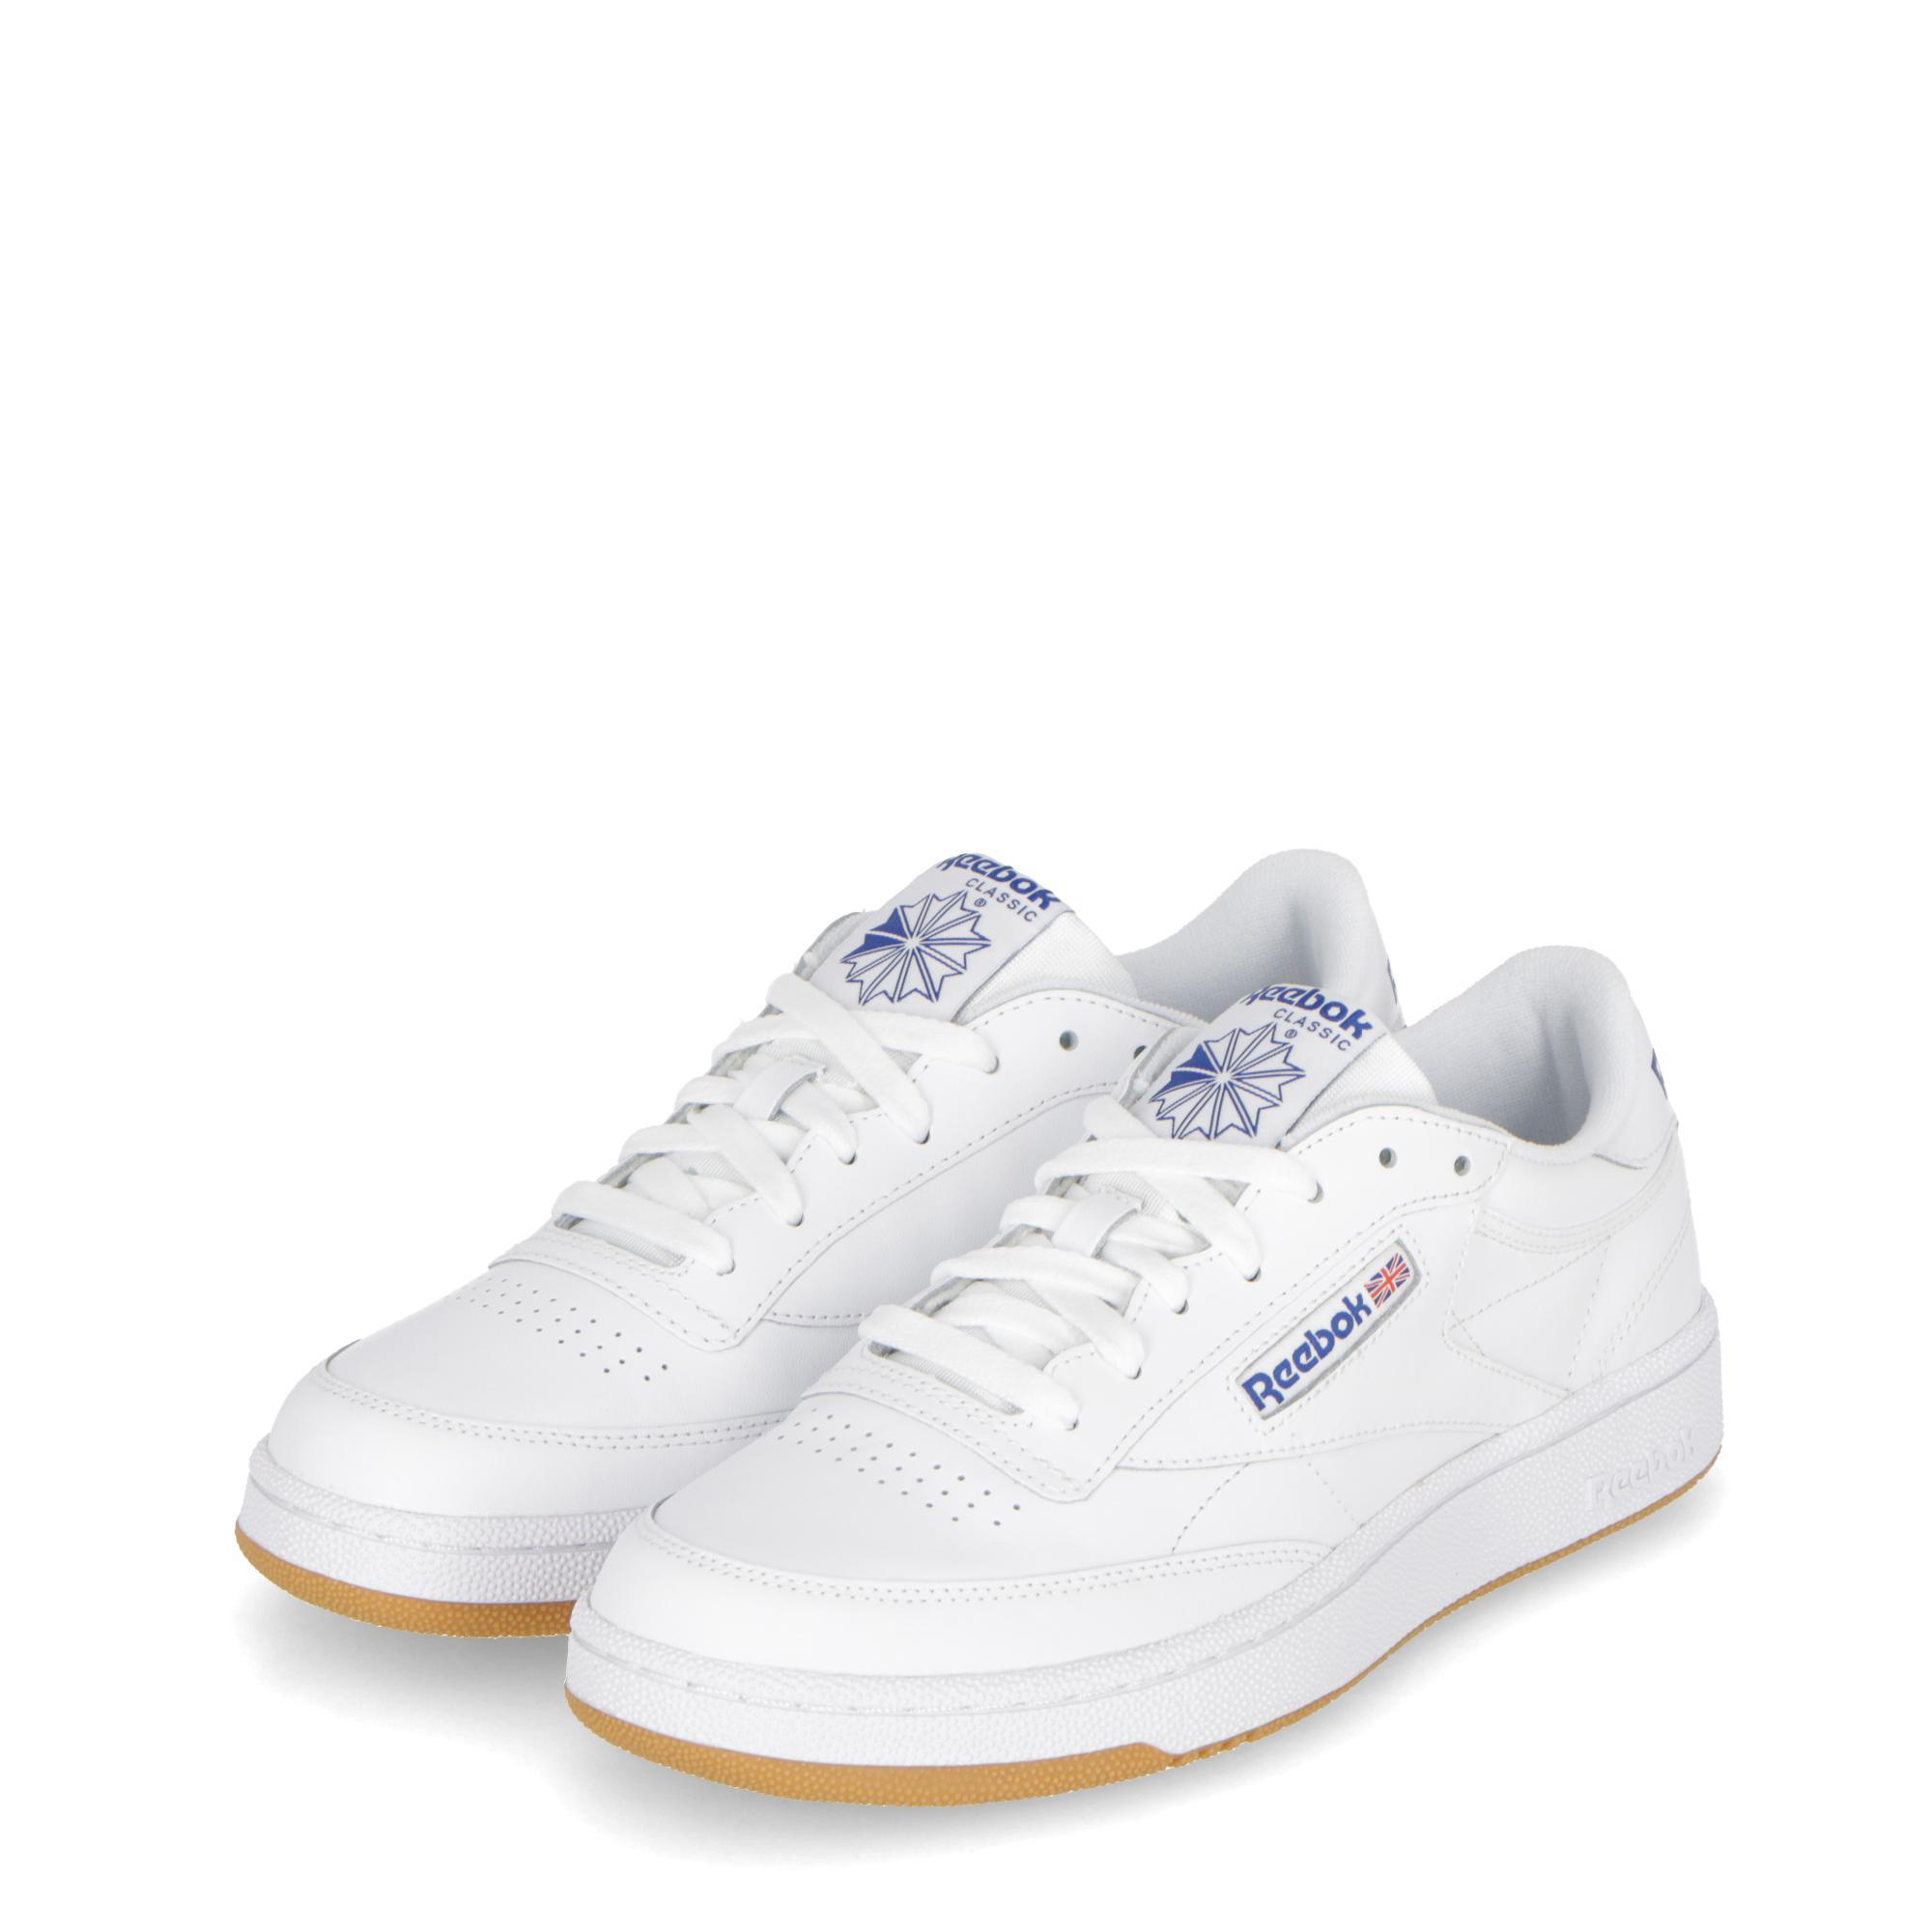 4ca7e5c5e27 Reebok Club C 85 Int-white royal-gum